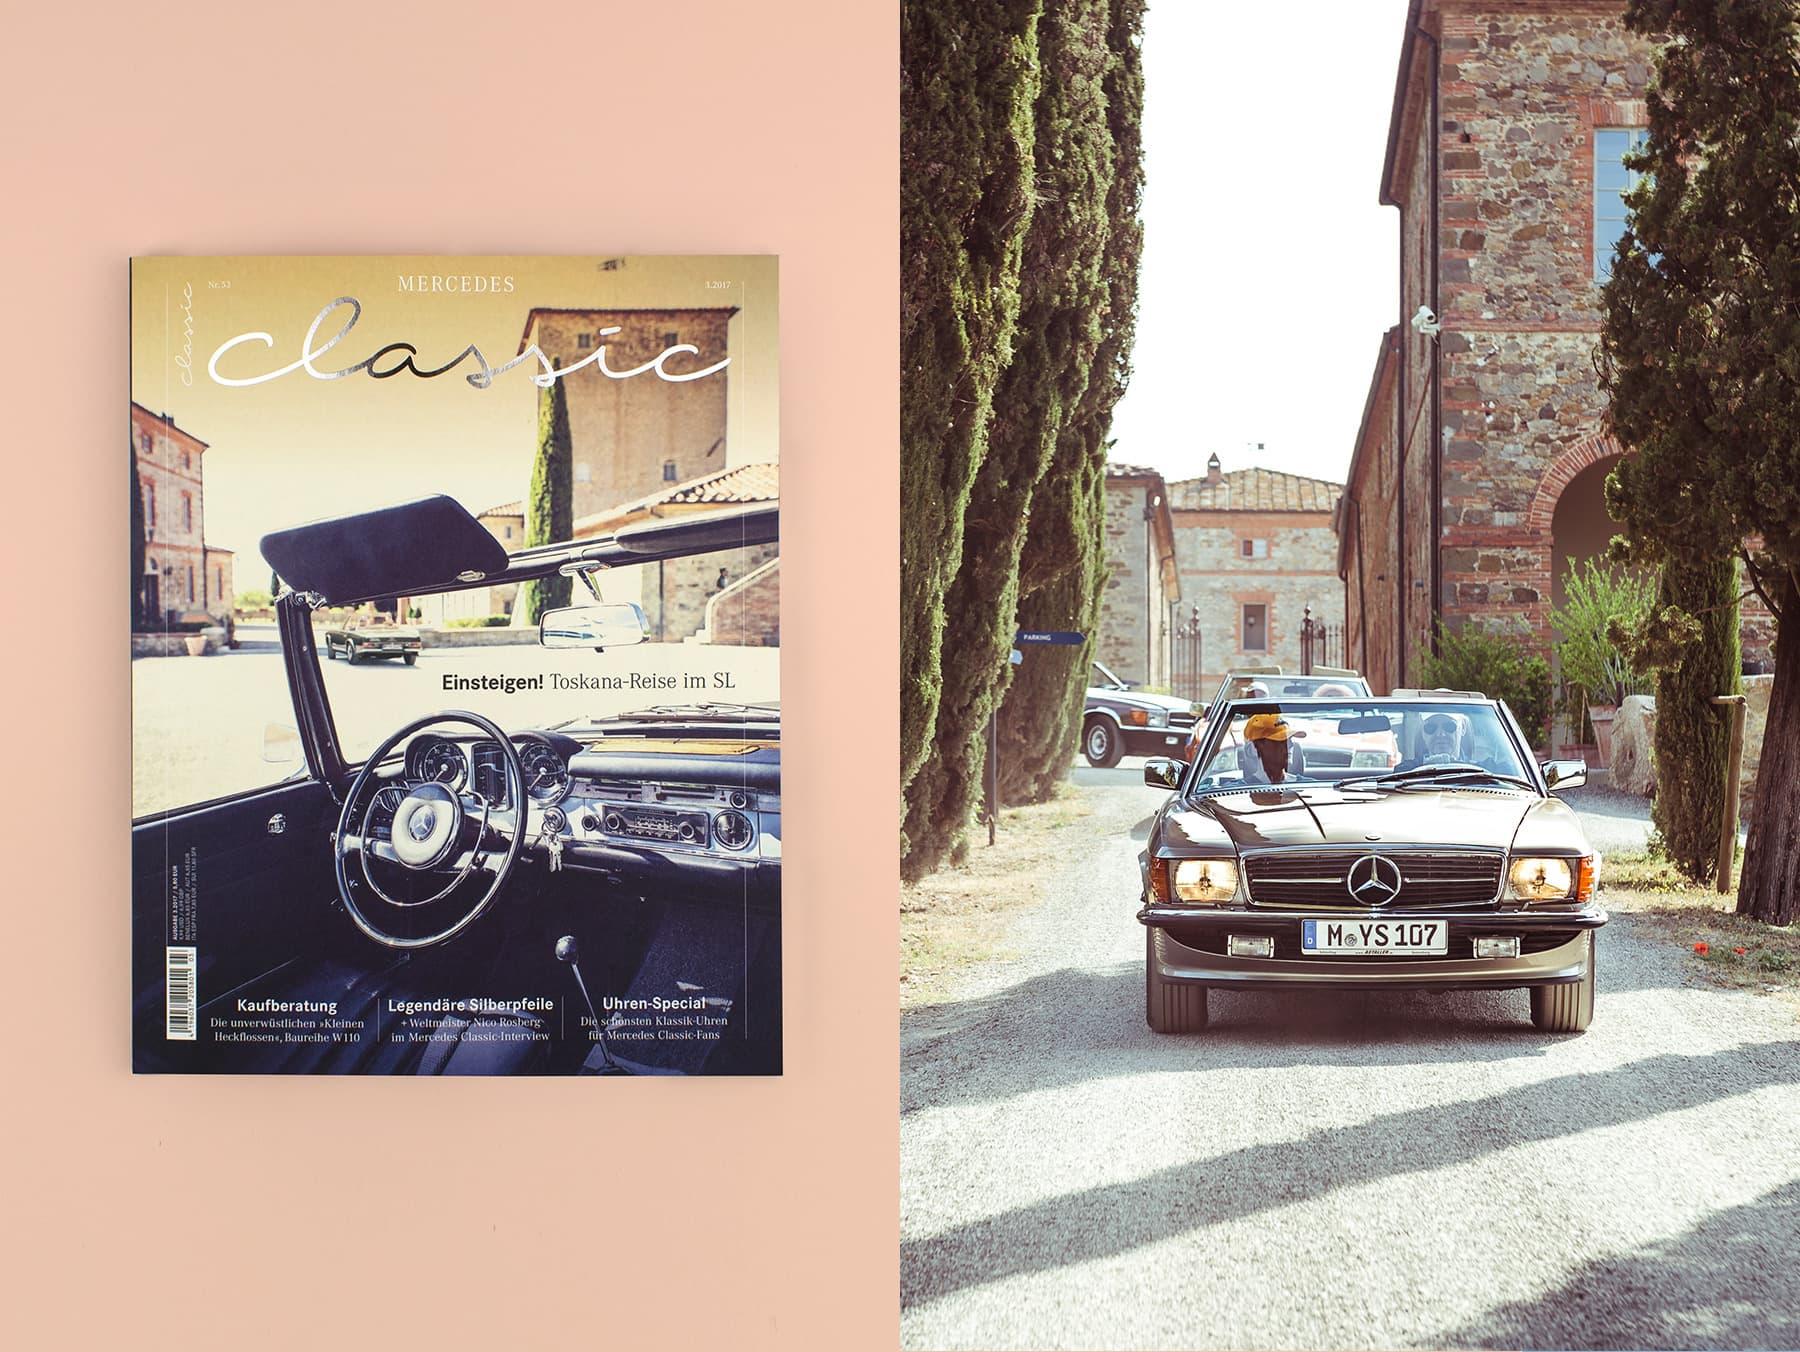 Bureau Johannes Erler – EST ErlerSkibbeTönsmann und Looping Group kooperieren bei Mercedes-Benz Magazinrelaunch.